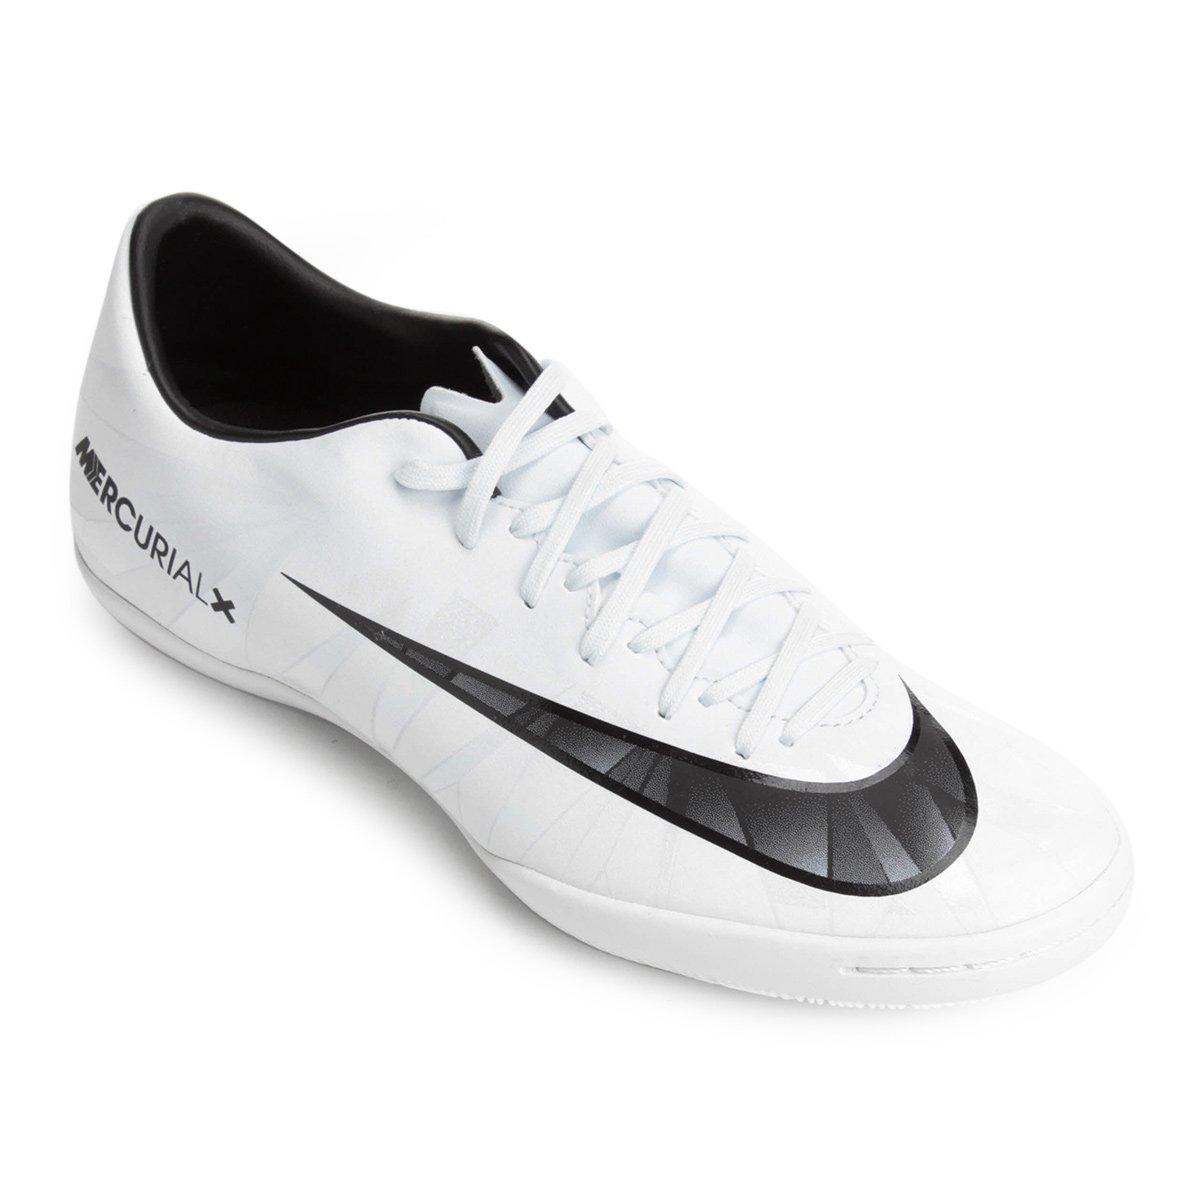 8edf3d842a Chuteira Futsal Nike Mercurial X Victory 6 CR7 IC - Compre Agora ...